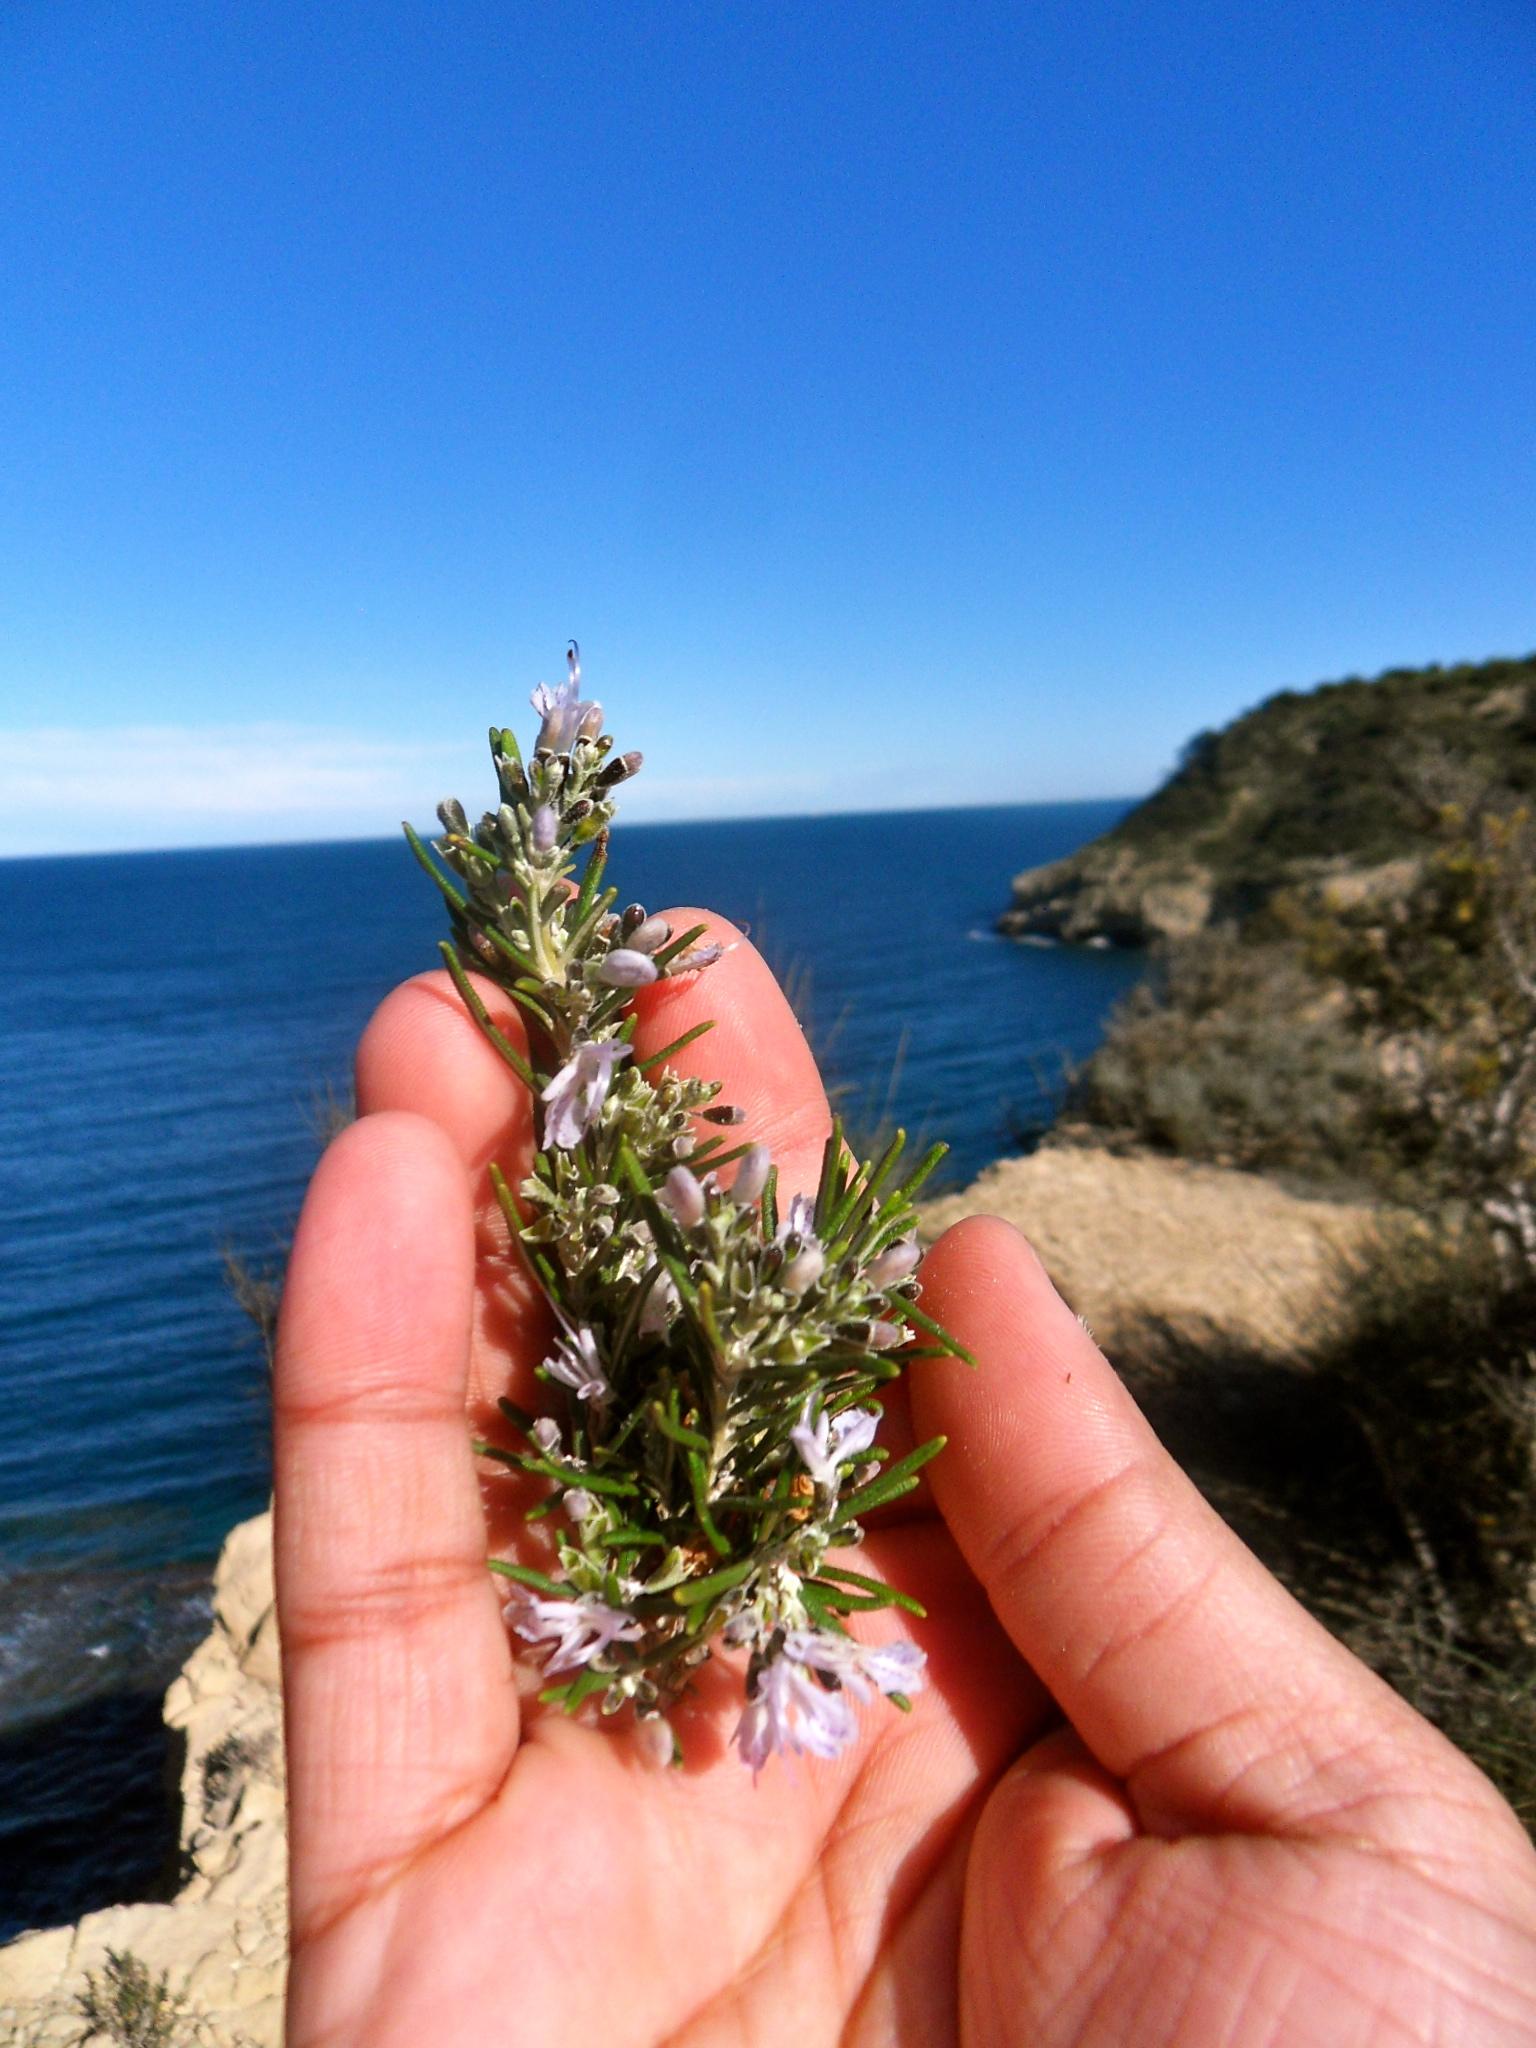 Herbs on my Hike